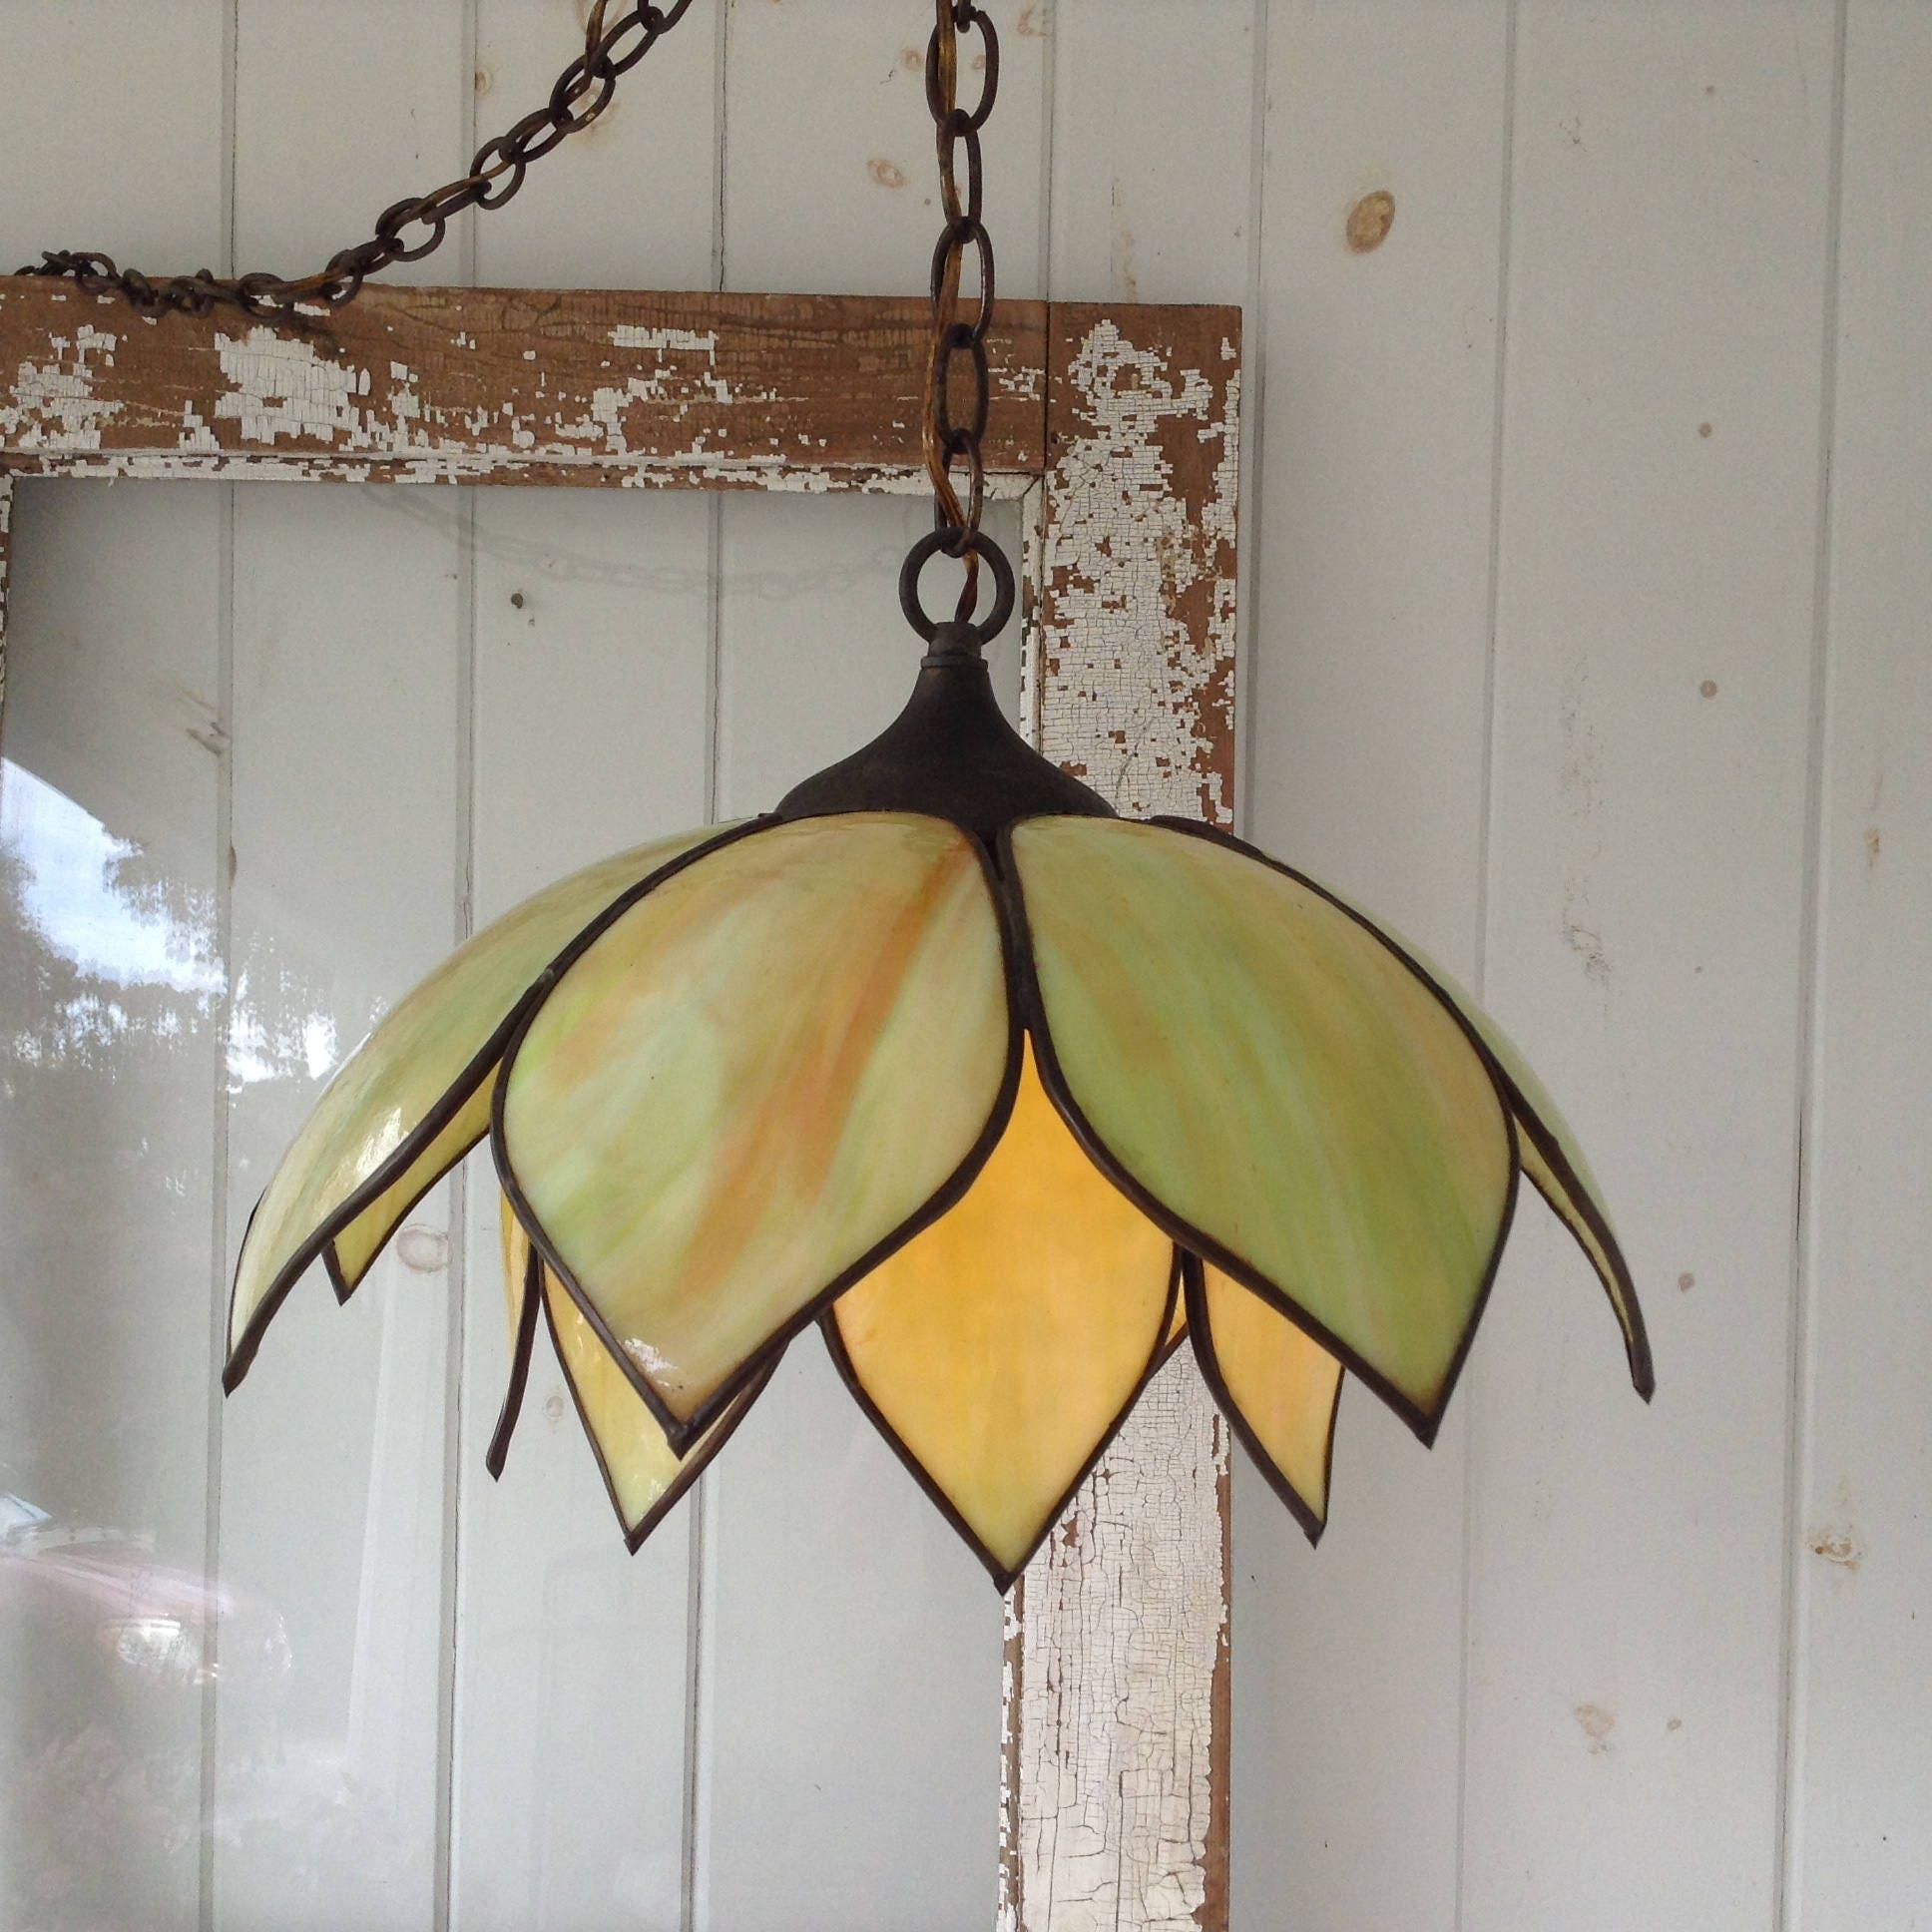 Vintage Double Tulip Lotus Flower Slag Glass Hanging Lamp Swag Light